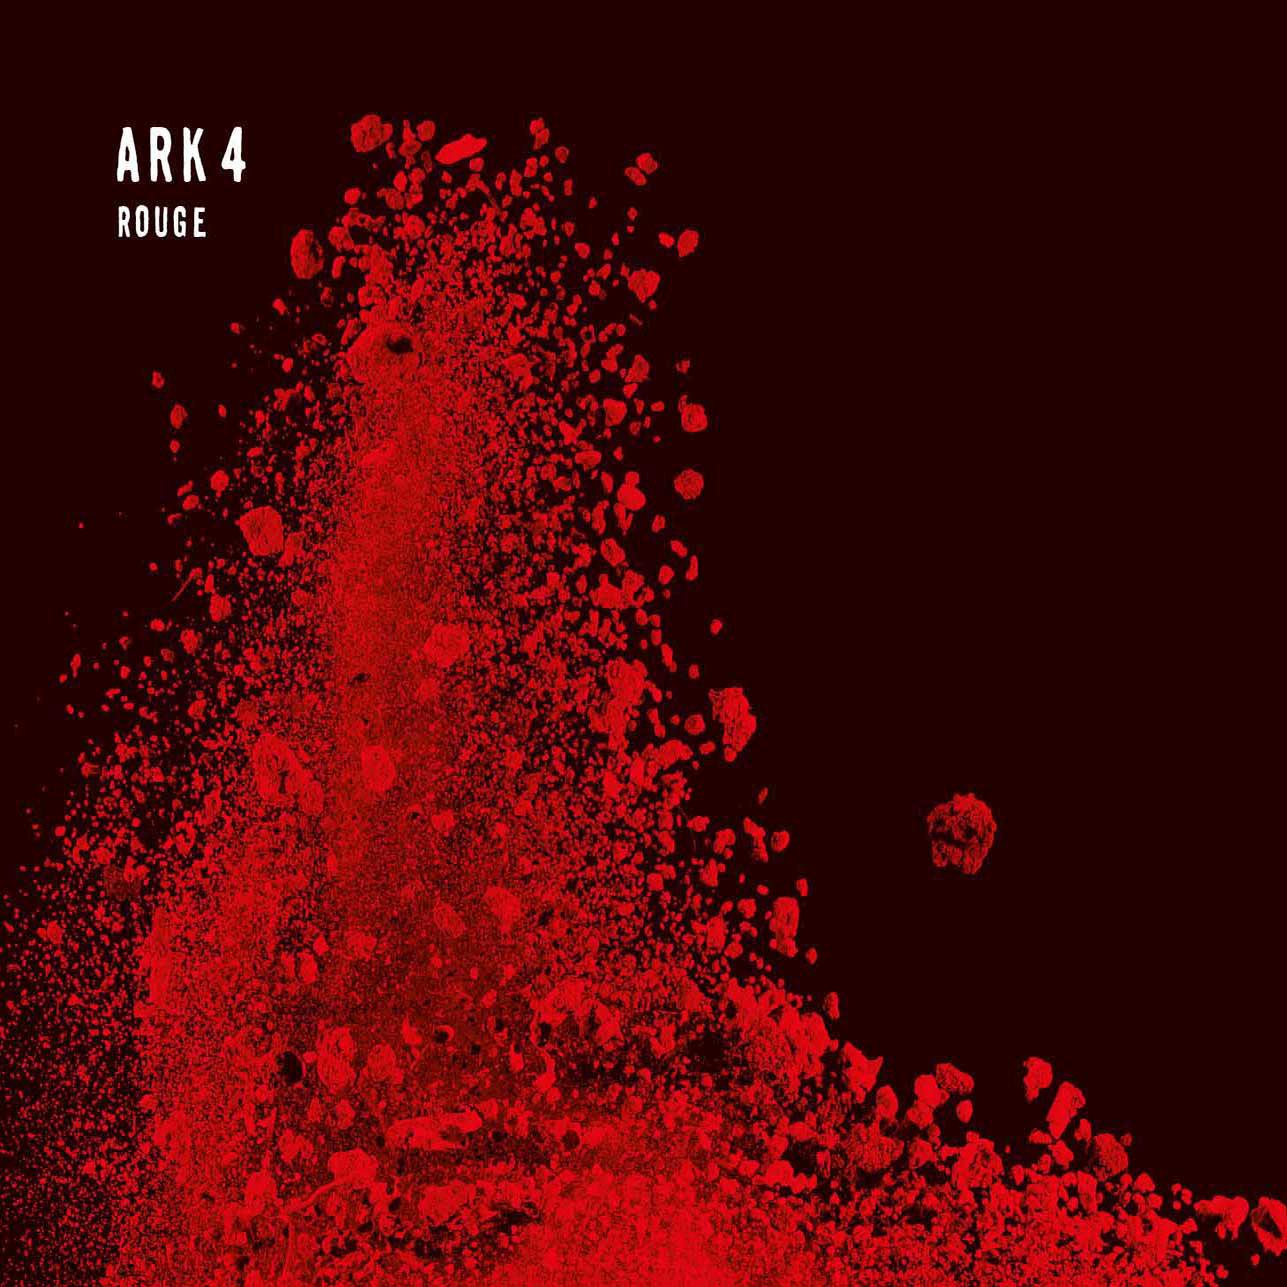 ark4 - Rouge